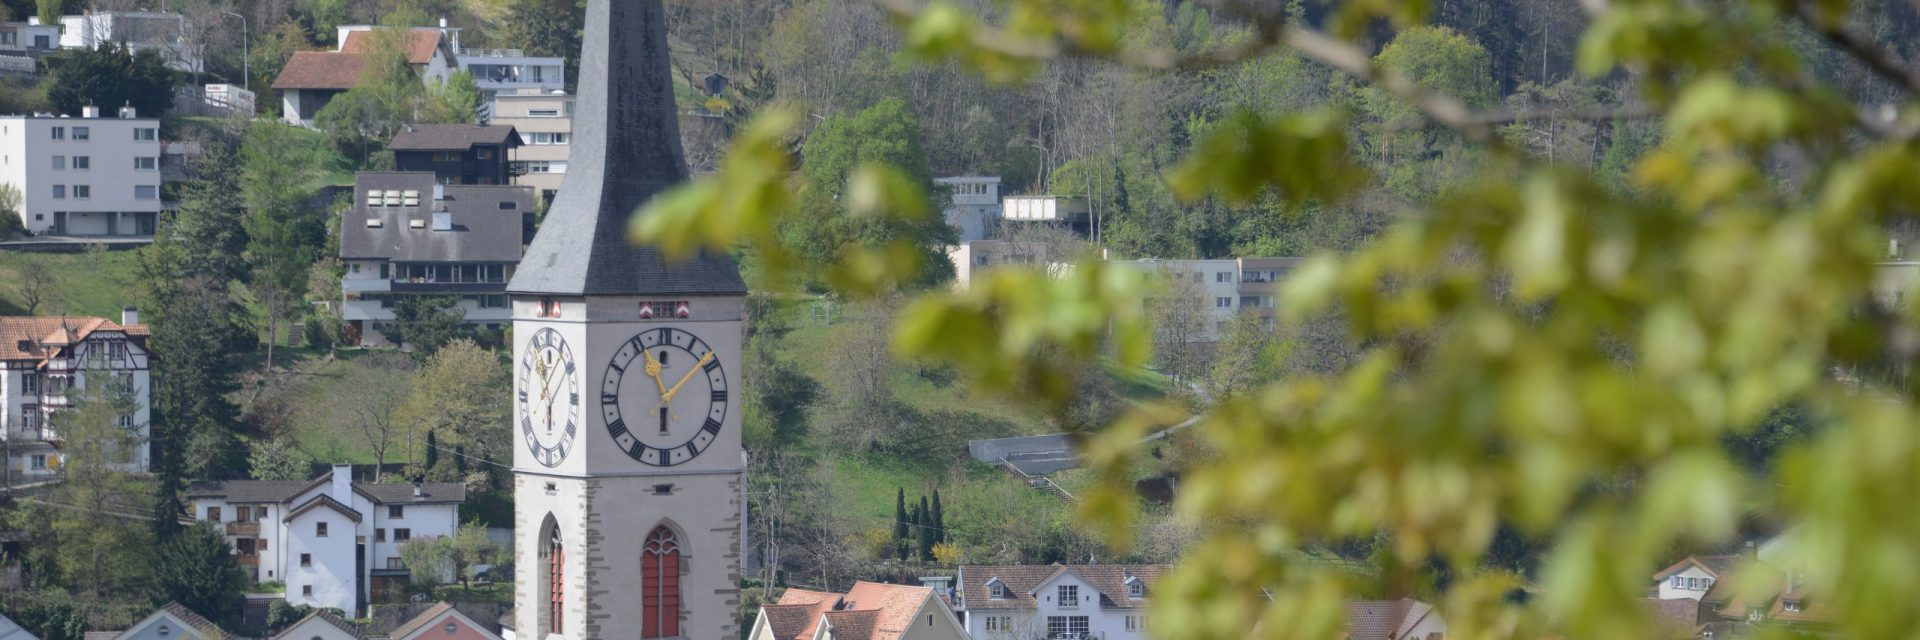 St.Martin, Martinskirche, Kirchen, Frühling